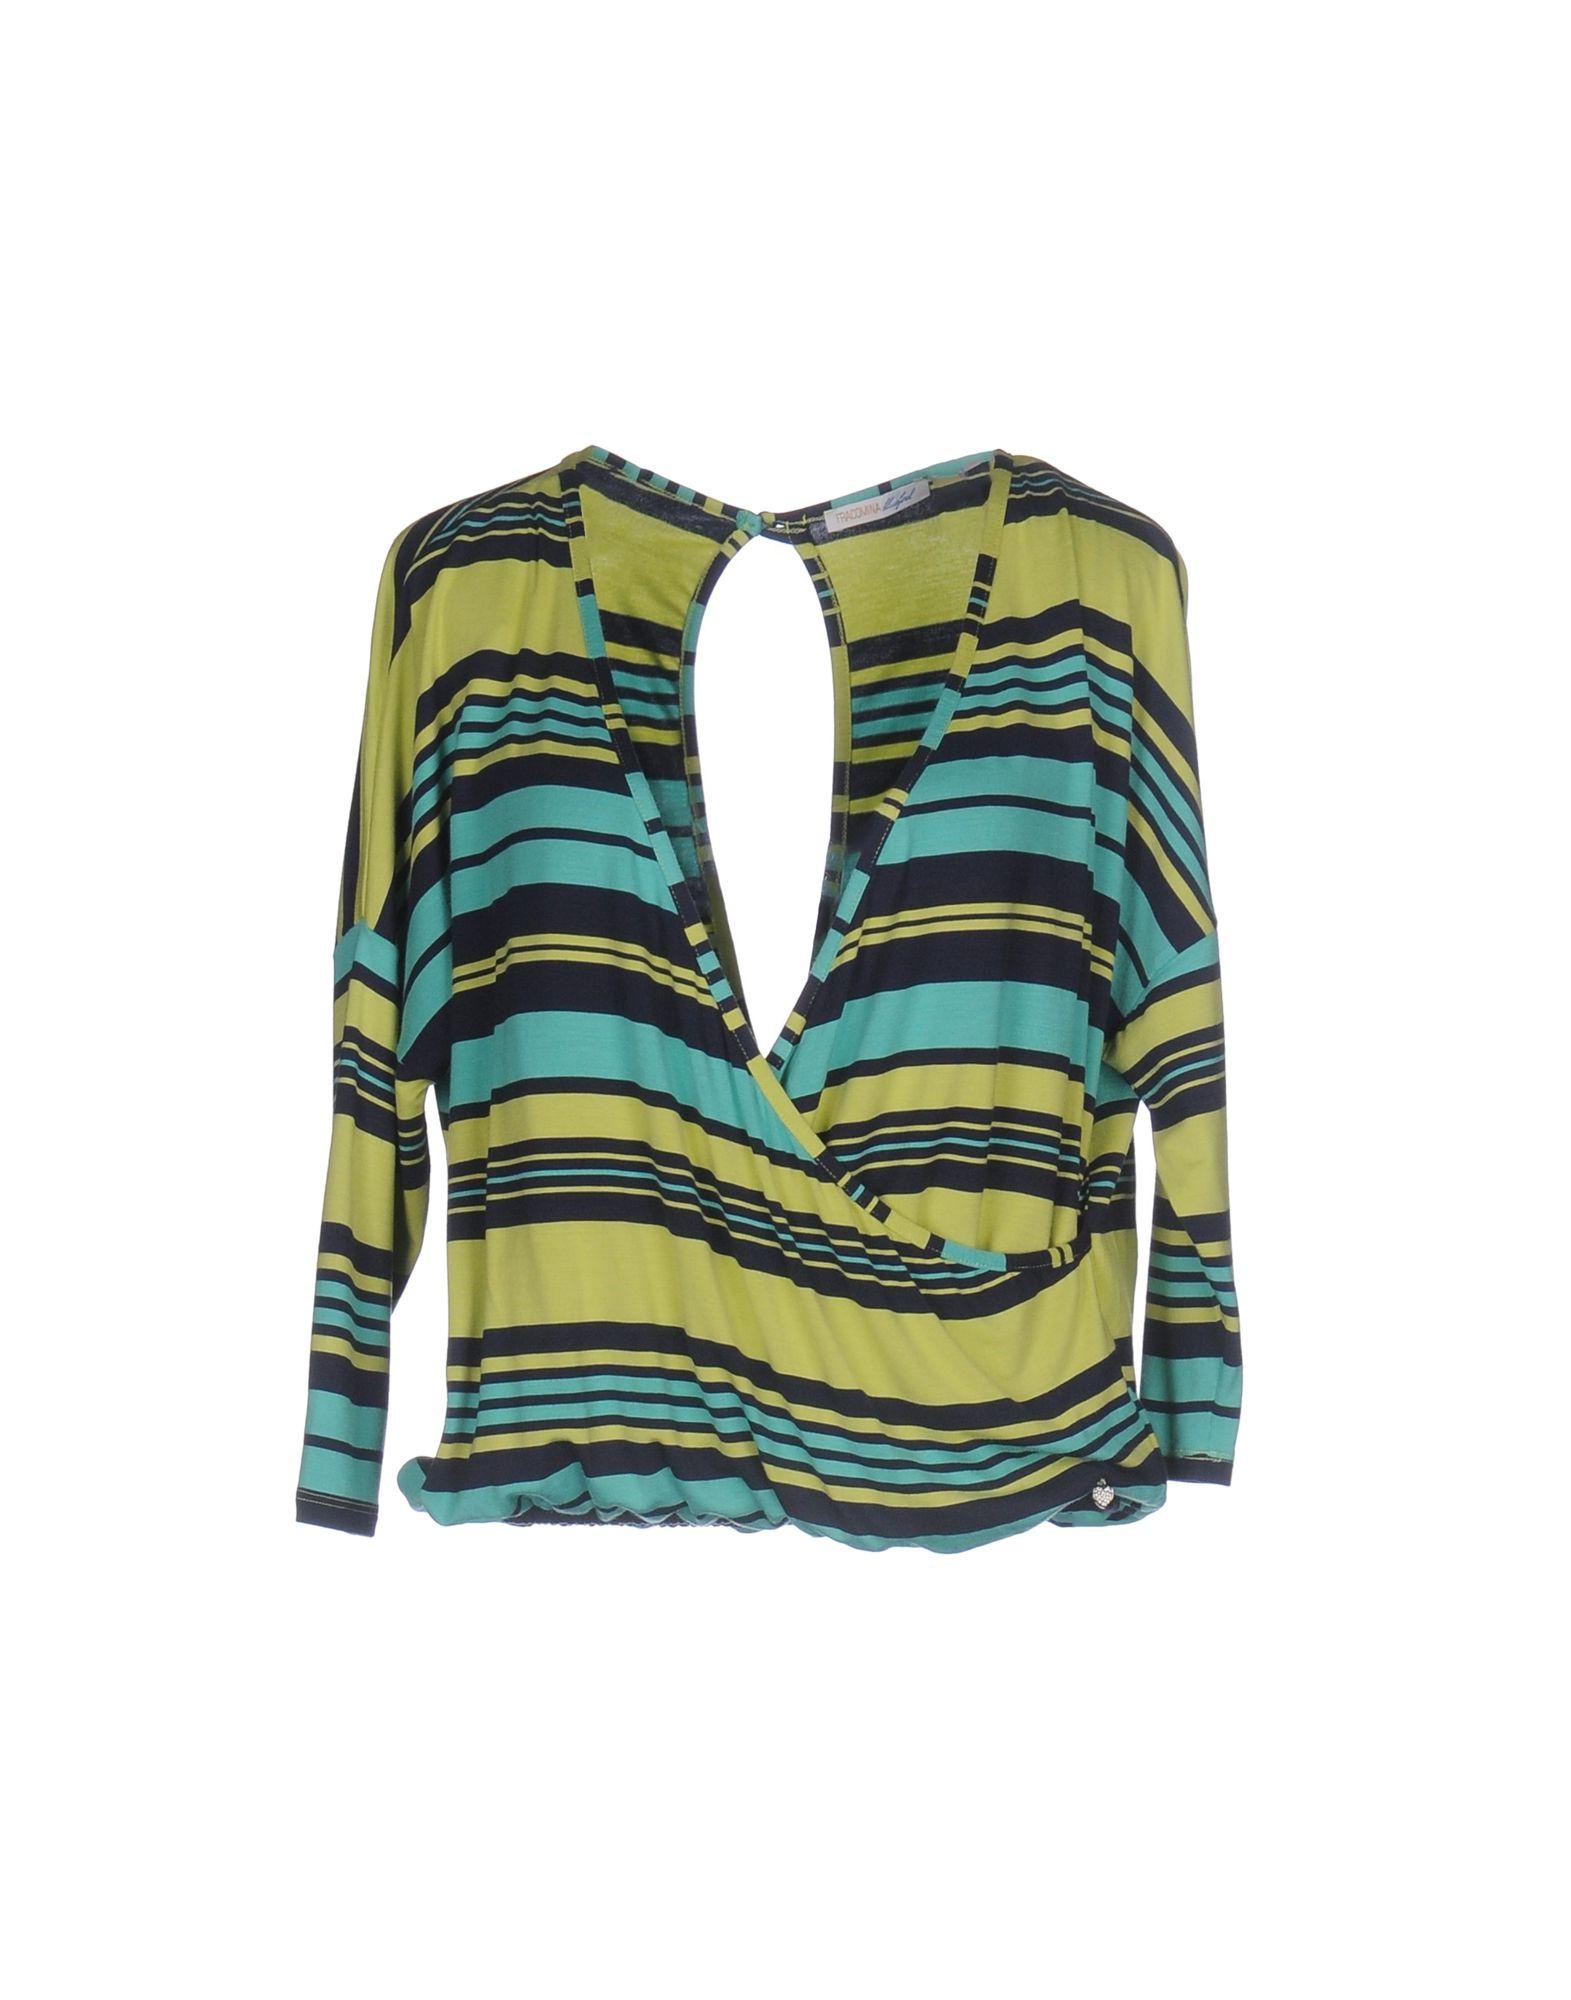 Shirt Bluefeel Online Acquista Su Fracomina By T Donna Yoox Zp5dx4qgwK 554e401b14e